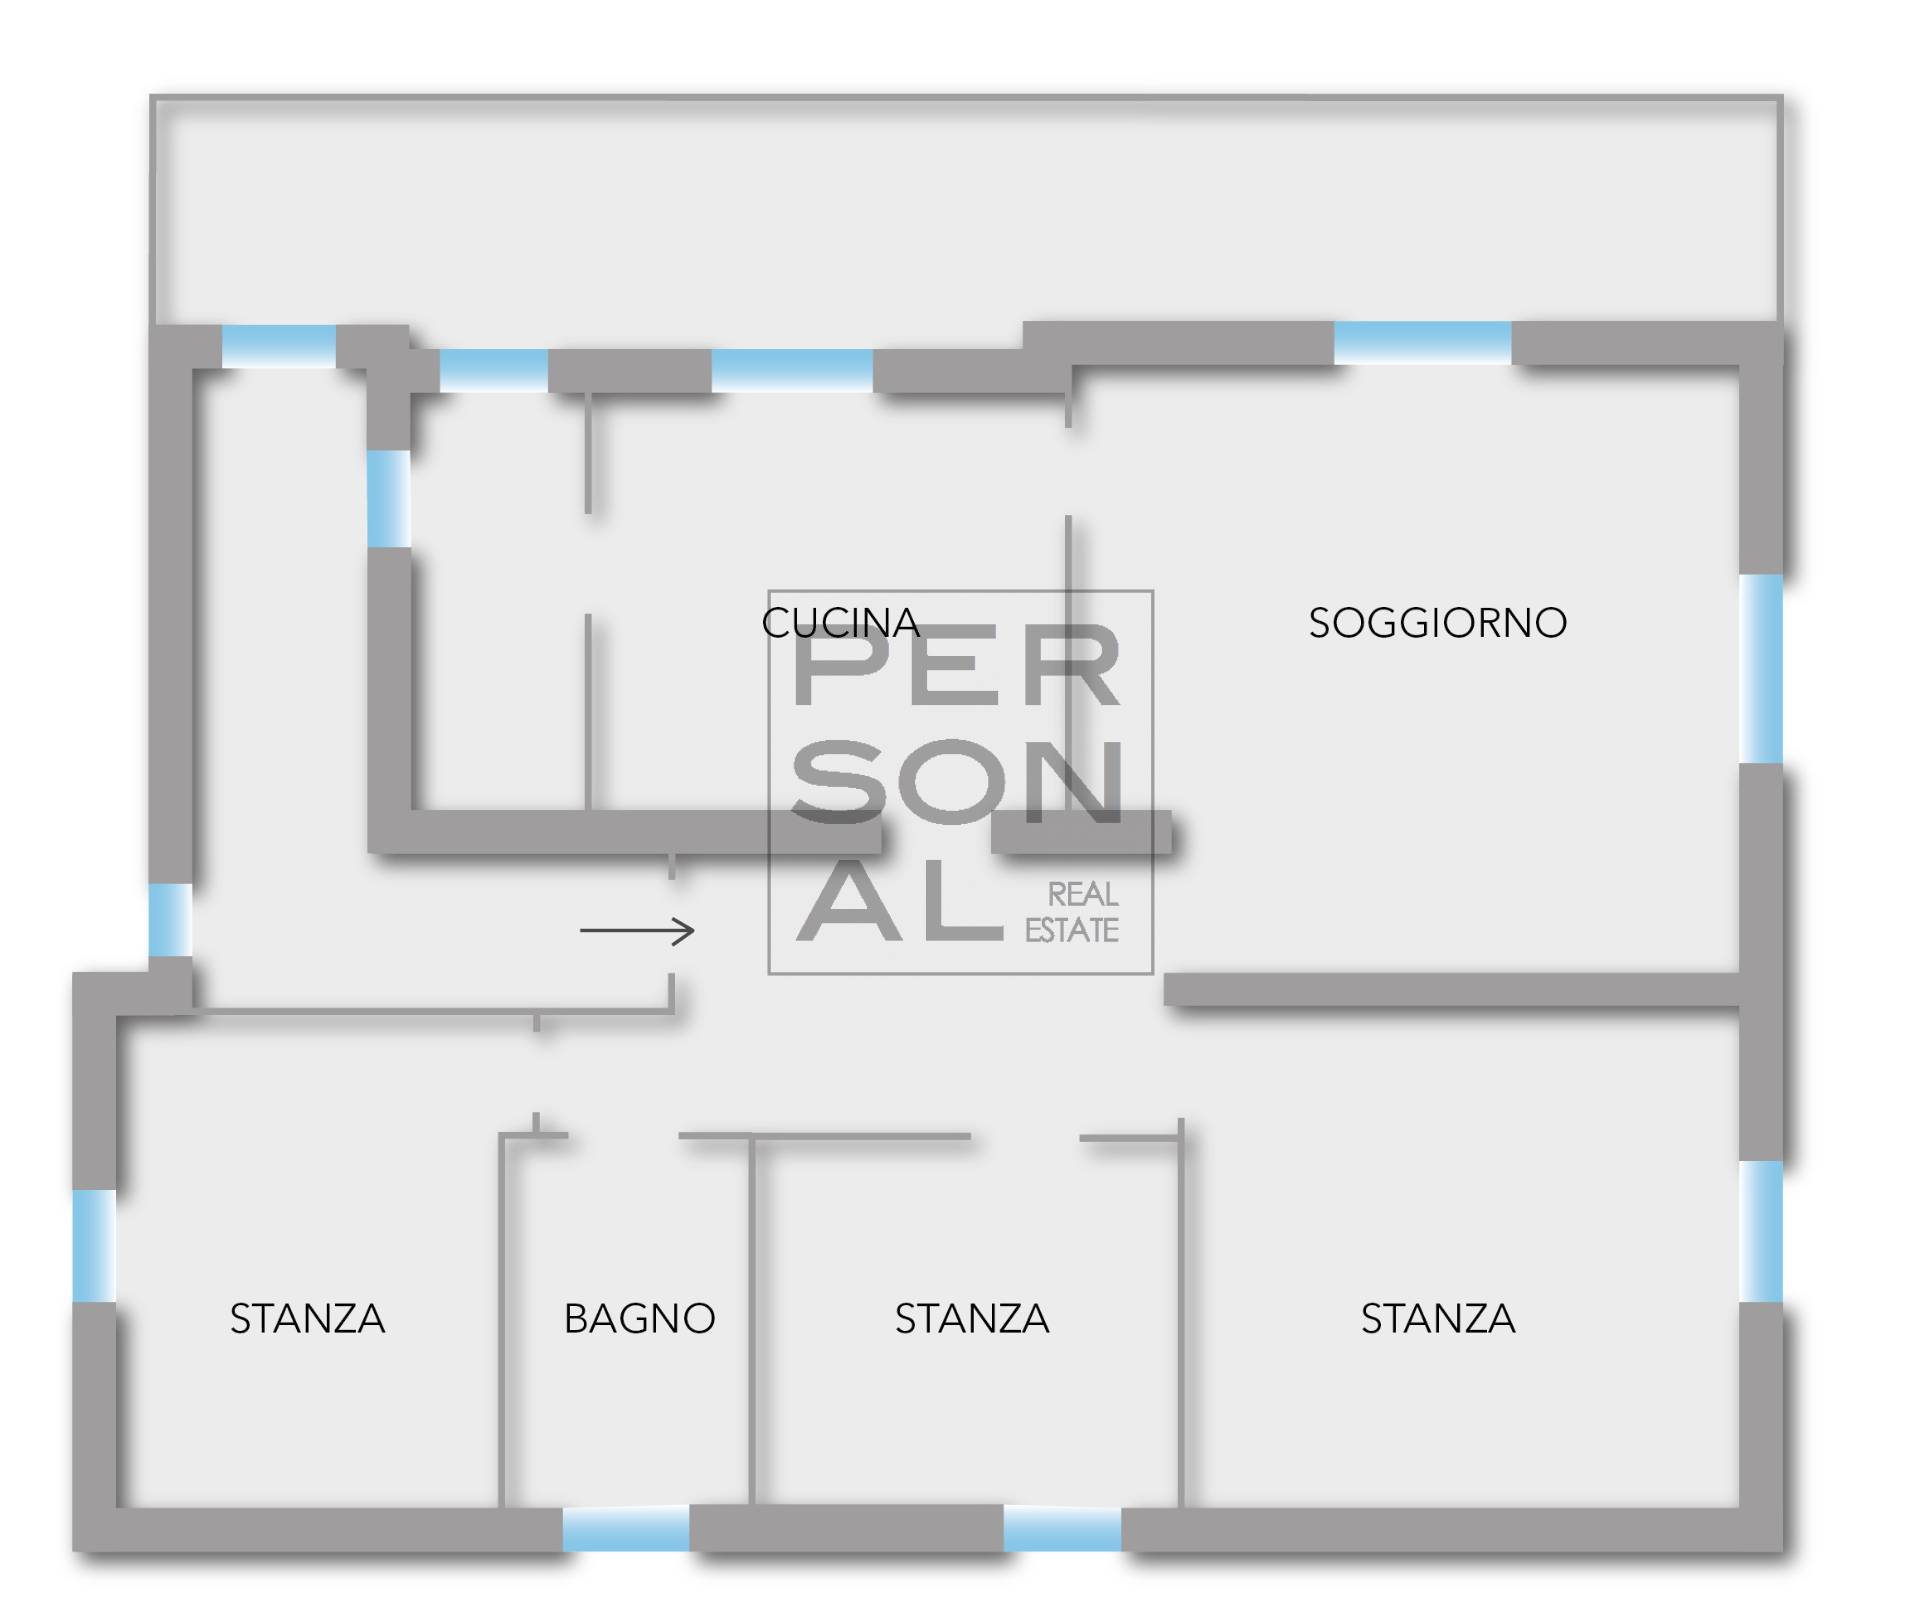 Casa Indipendente in vendita a Rovereto